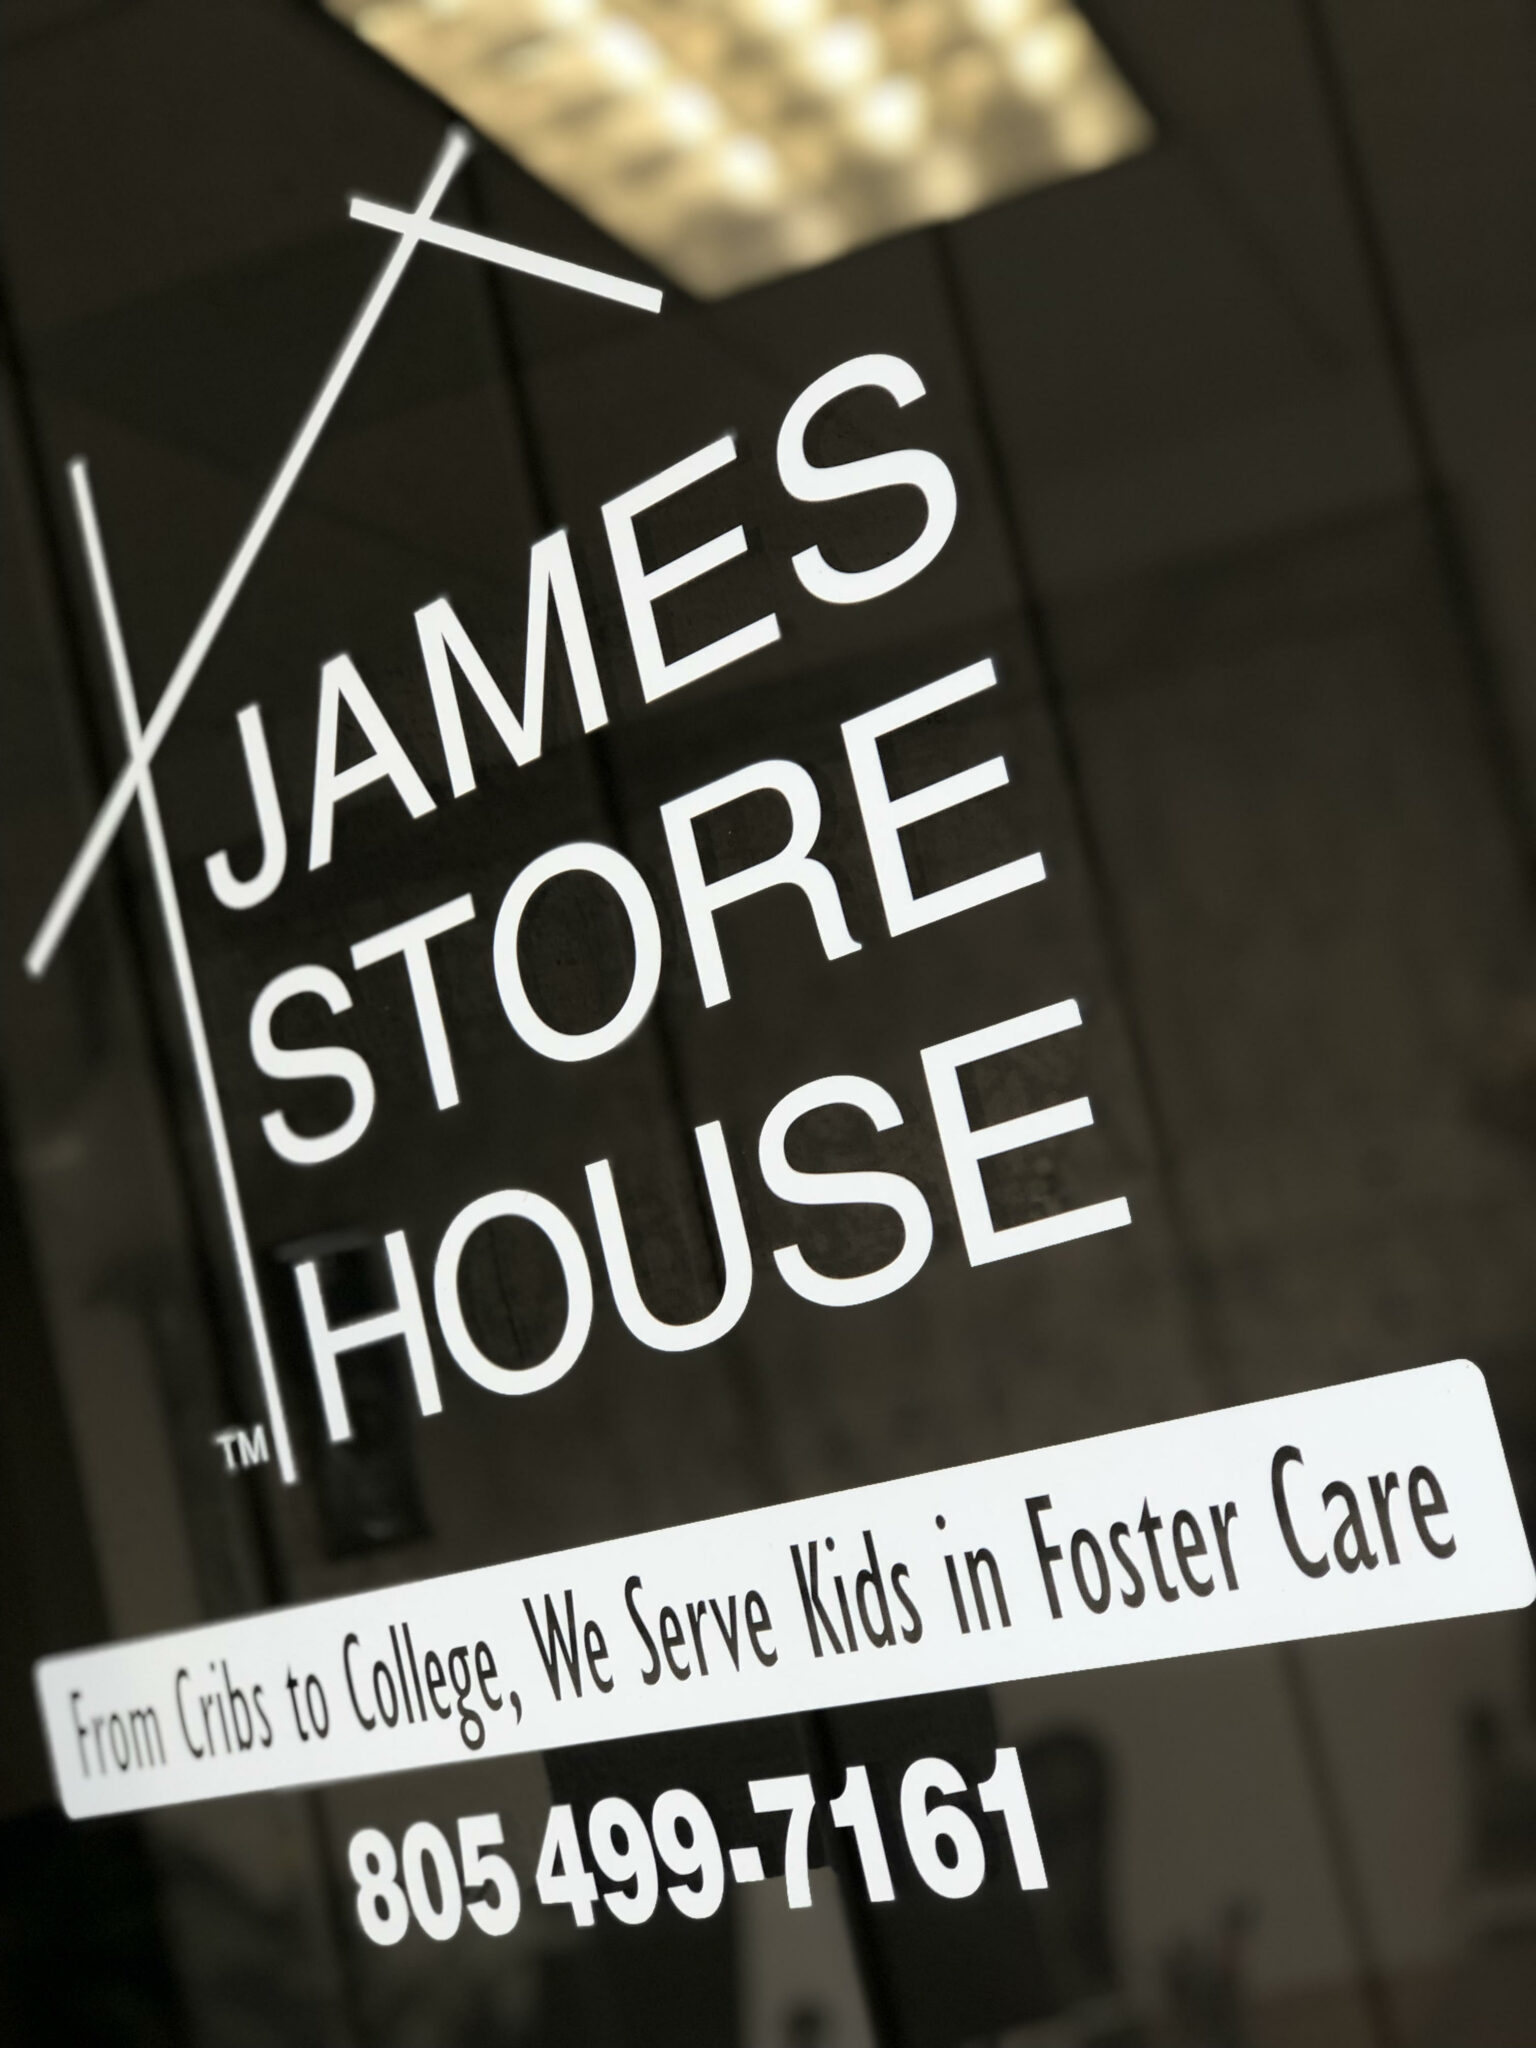 James Storehouse